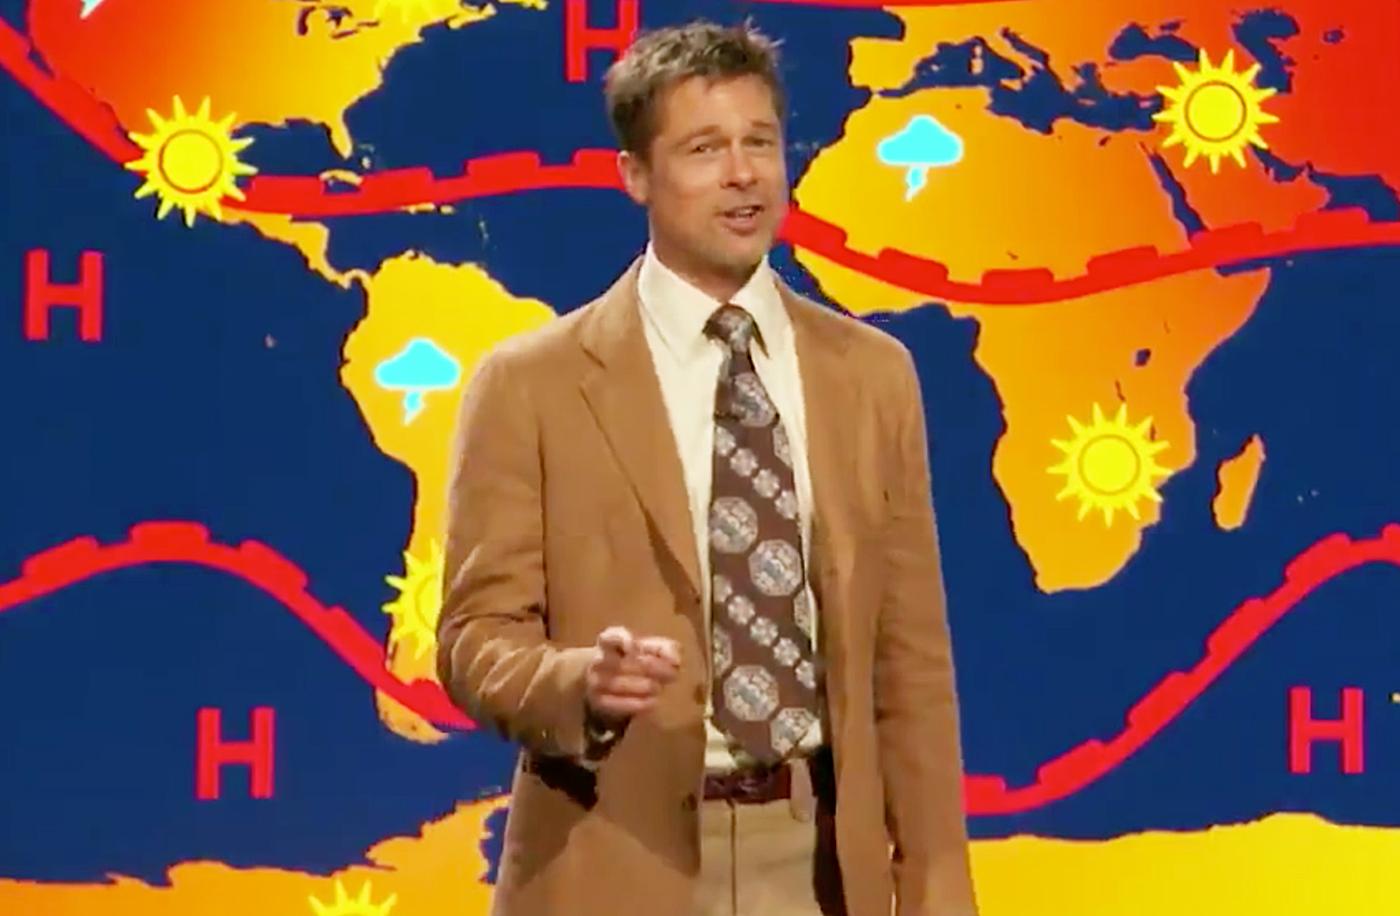 Brad Pitt weatherman The Jim Jefferies Show